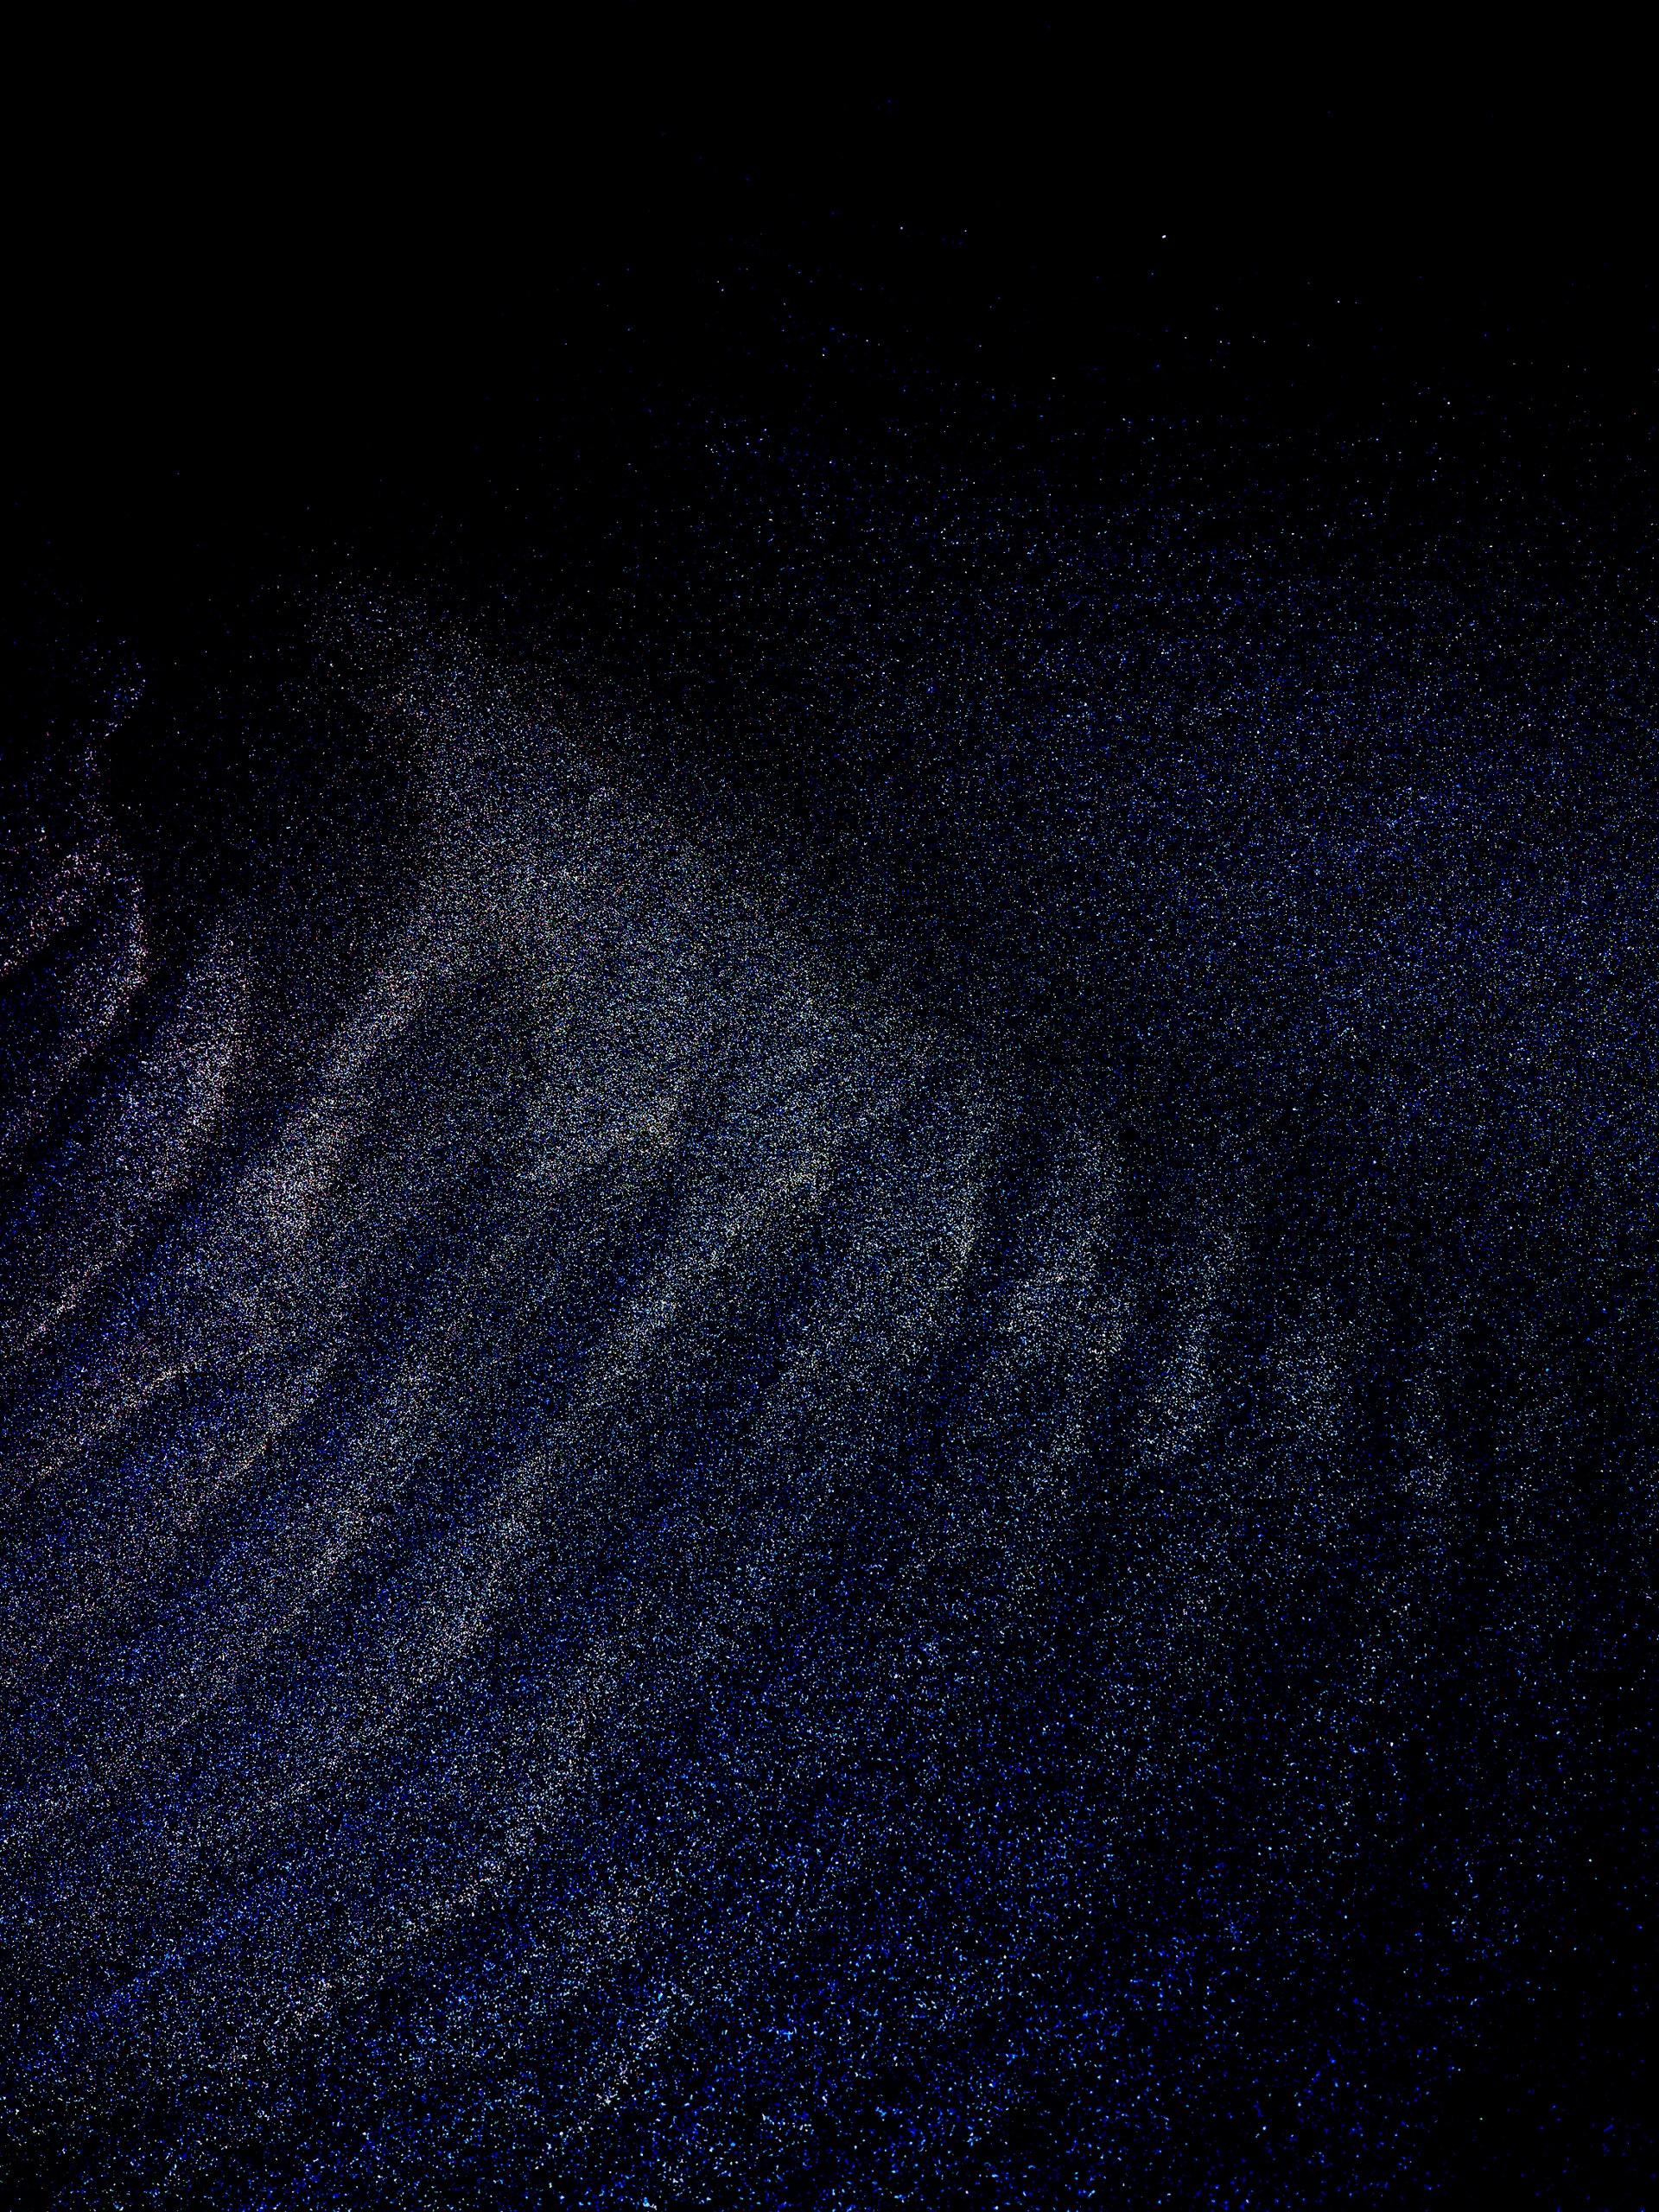 GRAINS OF SAND  VI  | 2021